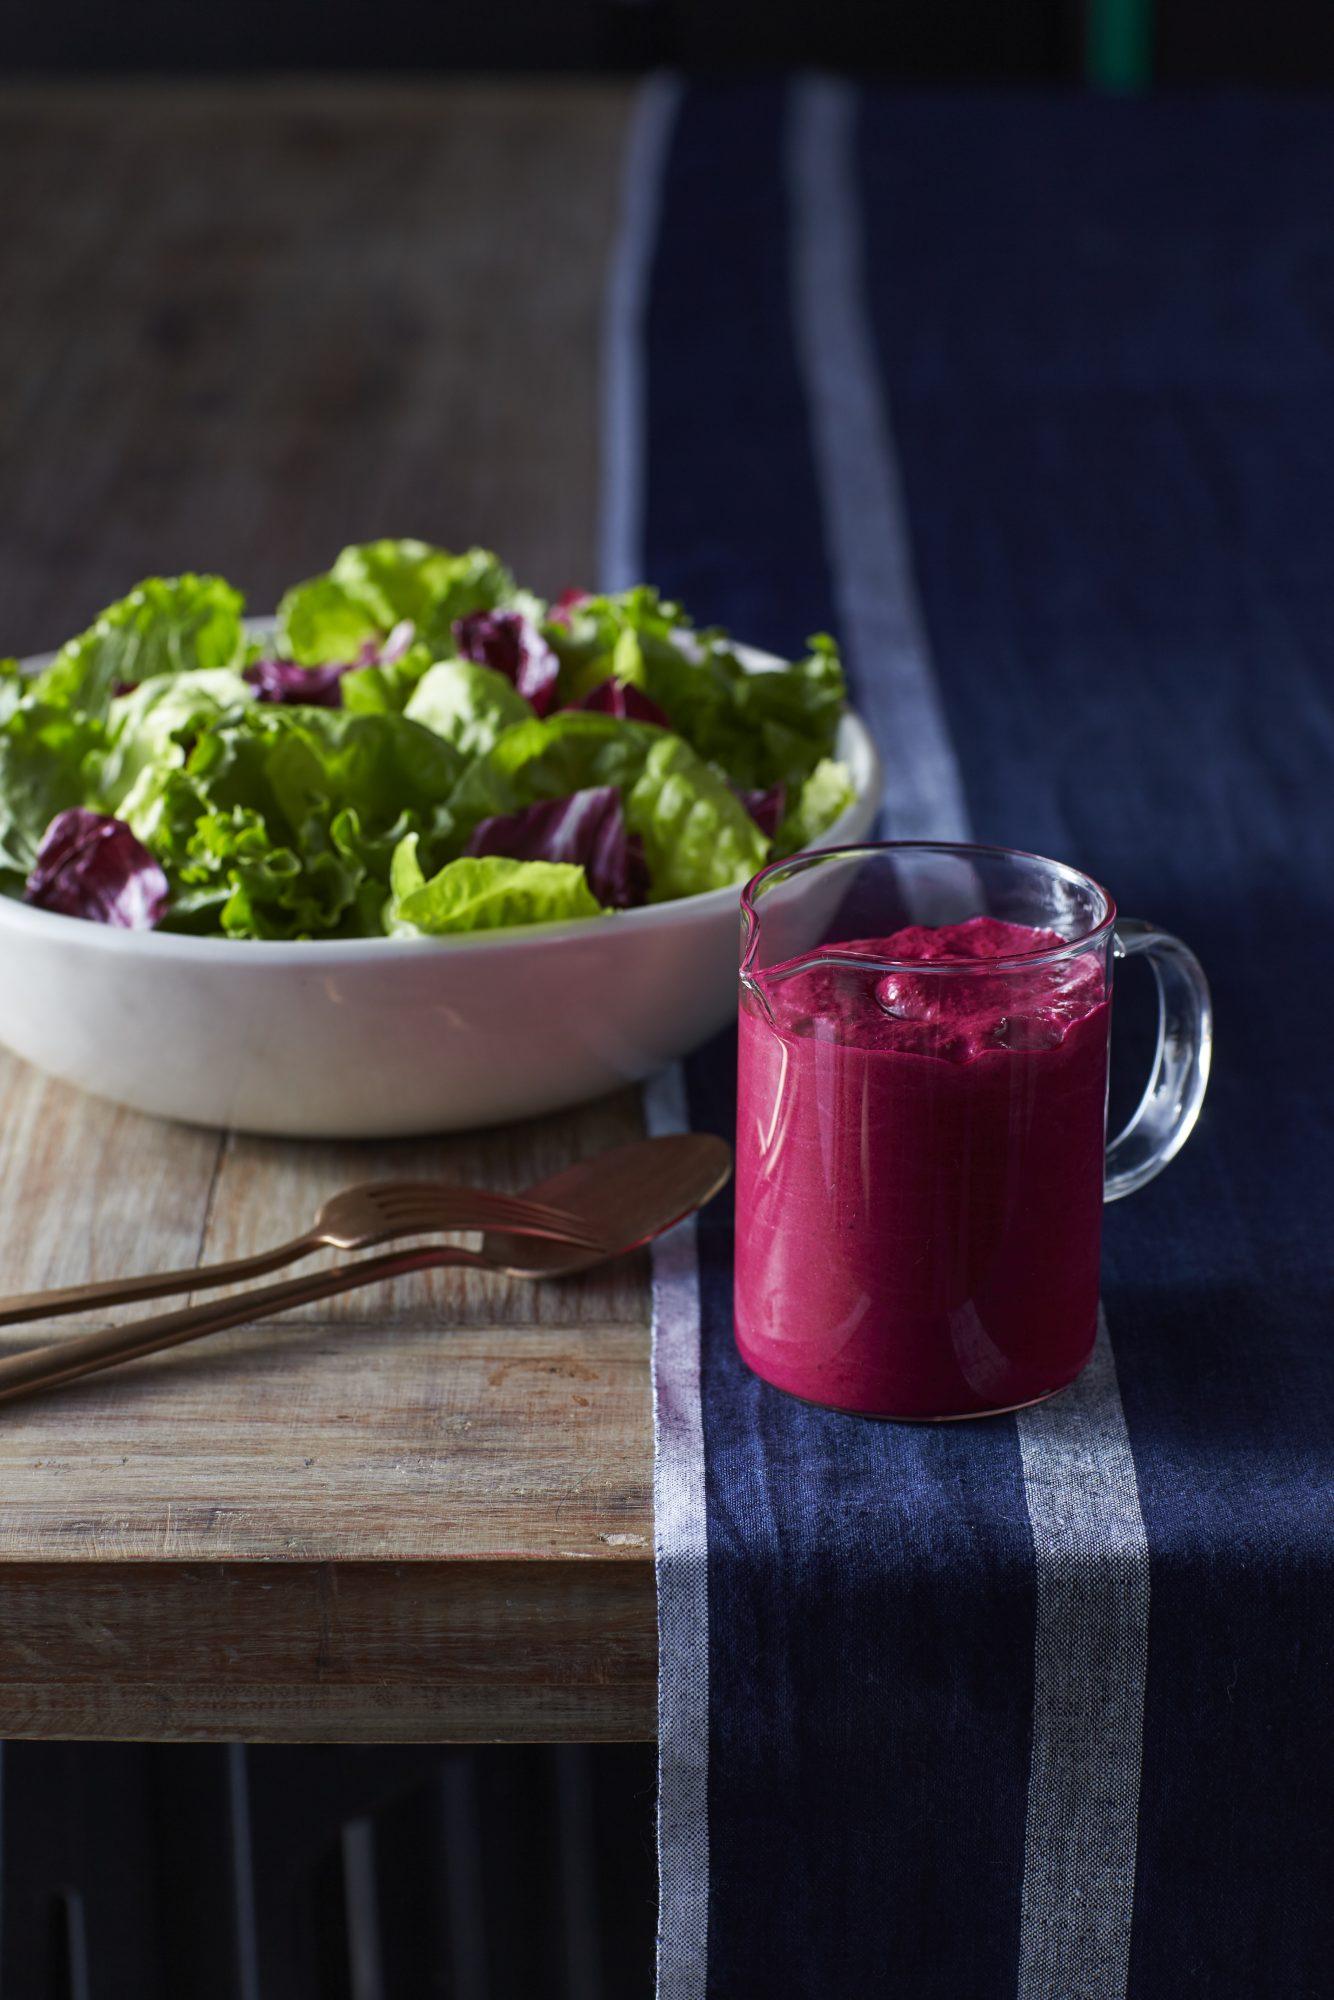 mr-green-salad-beet-dressing-image